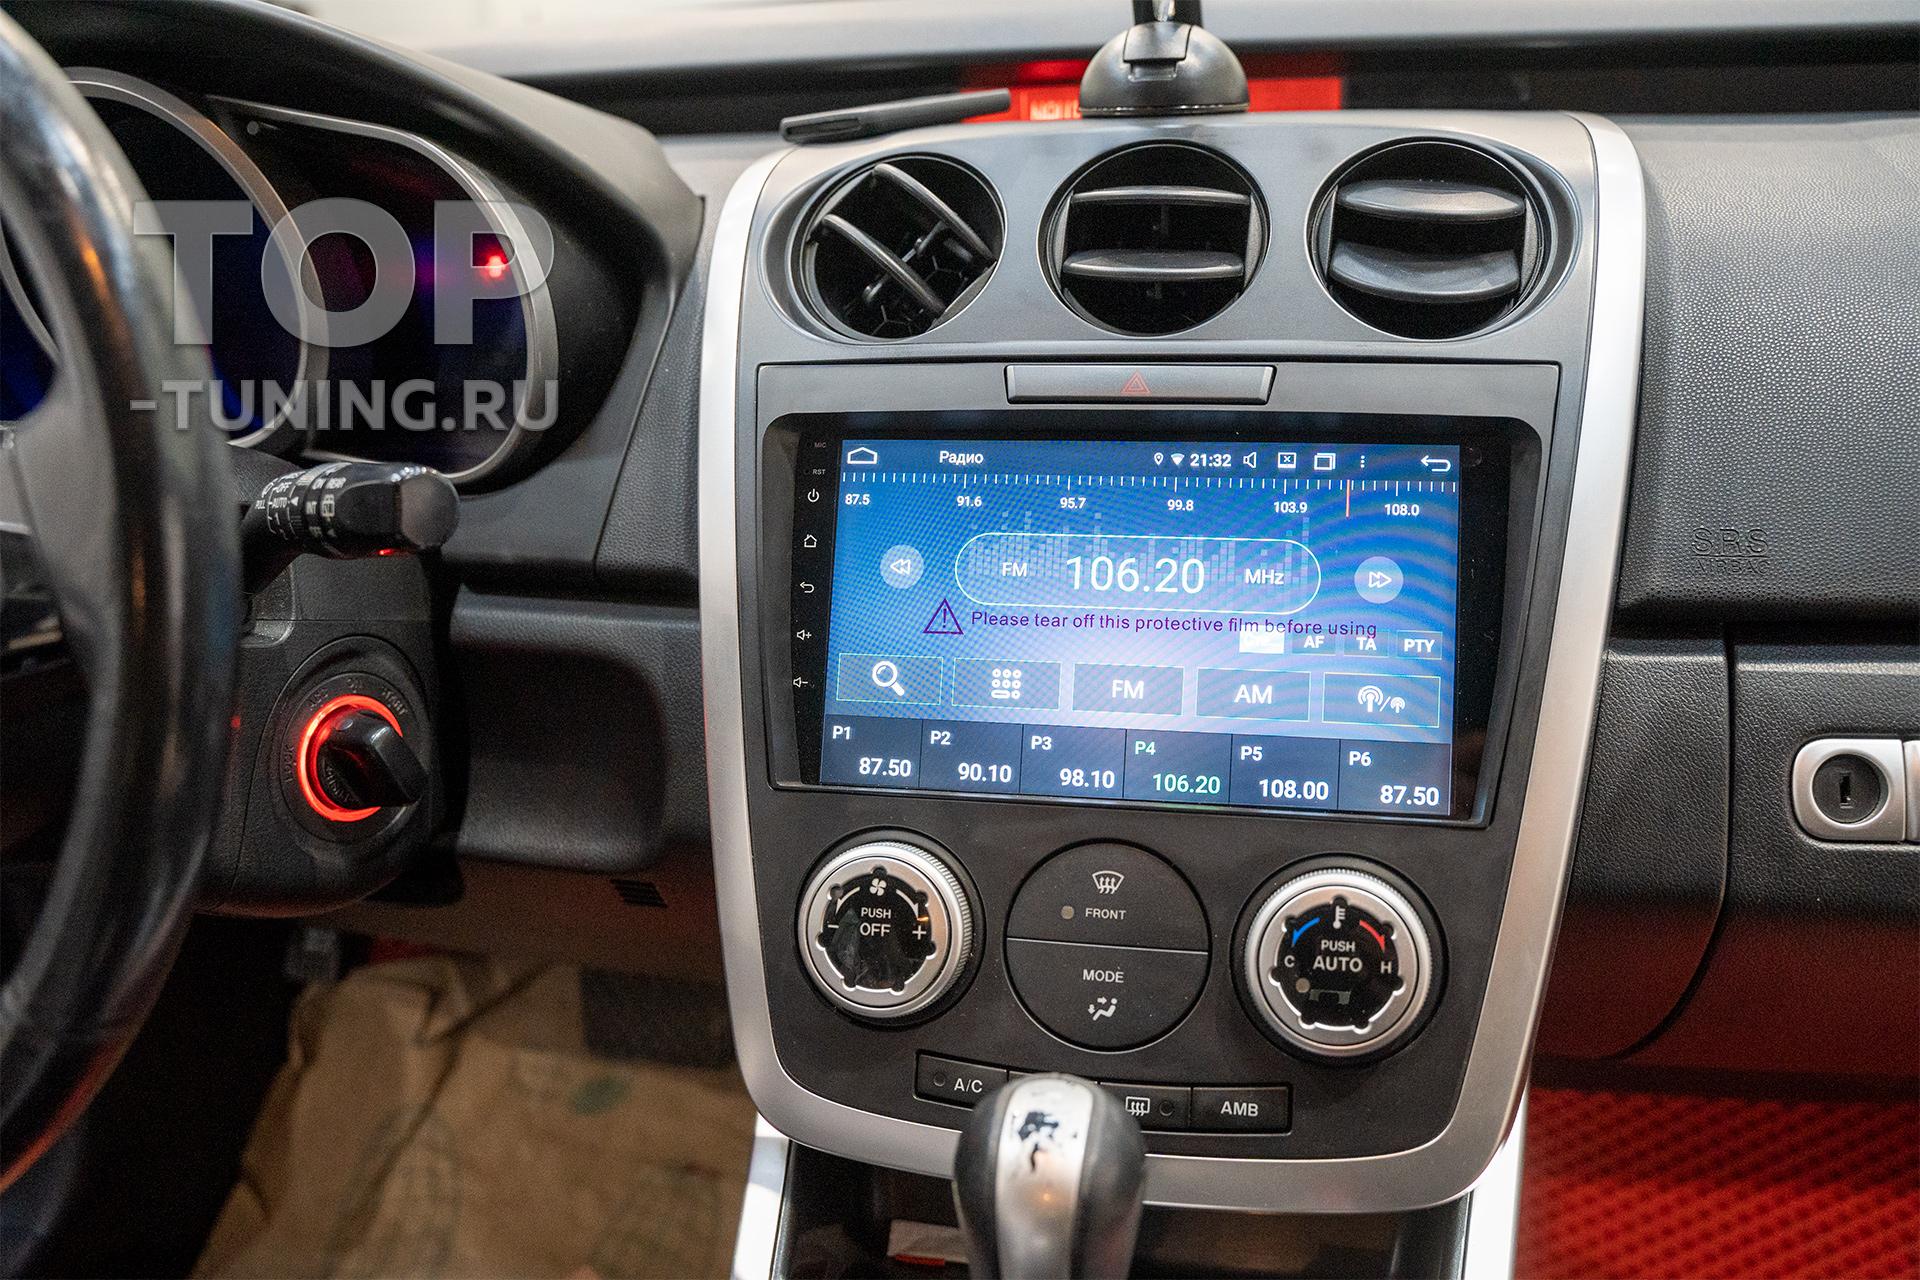 103888 новая мультимедиа в Mazda CX-7 (Youtube, Яндекс Навигатор, Телевидение)